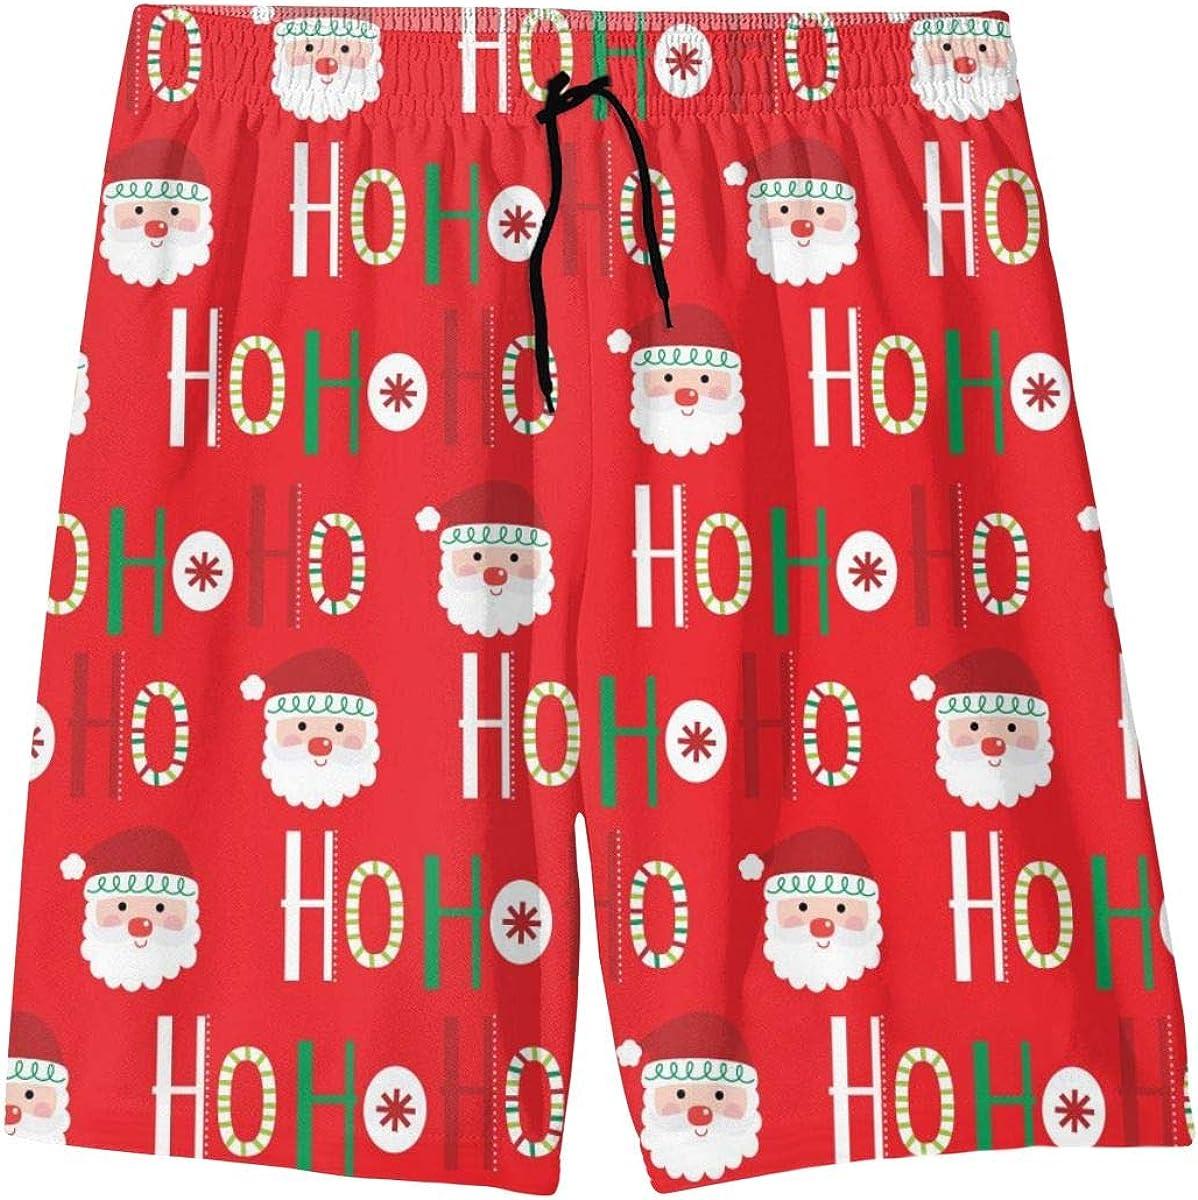 Teenager Swim Trunks Ho-ho-ho Script Cute Santa Face Beach Pants Quick Dry Board Shorts Bathing Suit for Boys Girls